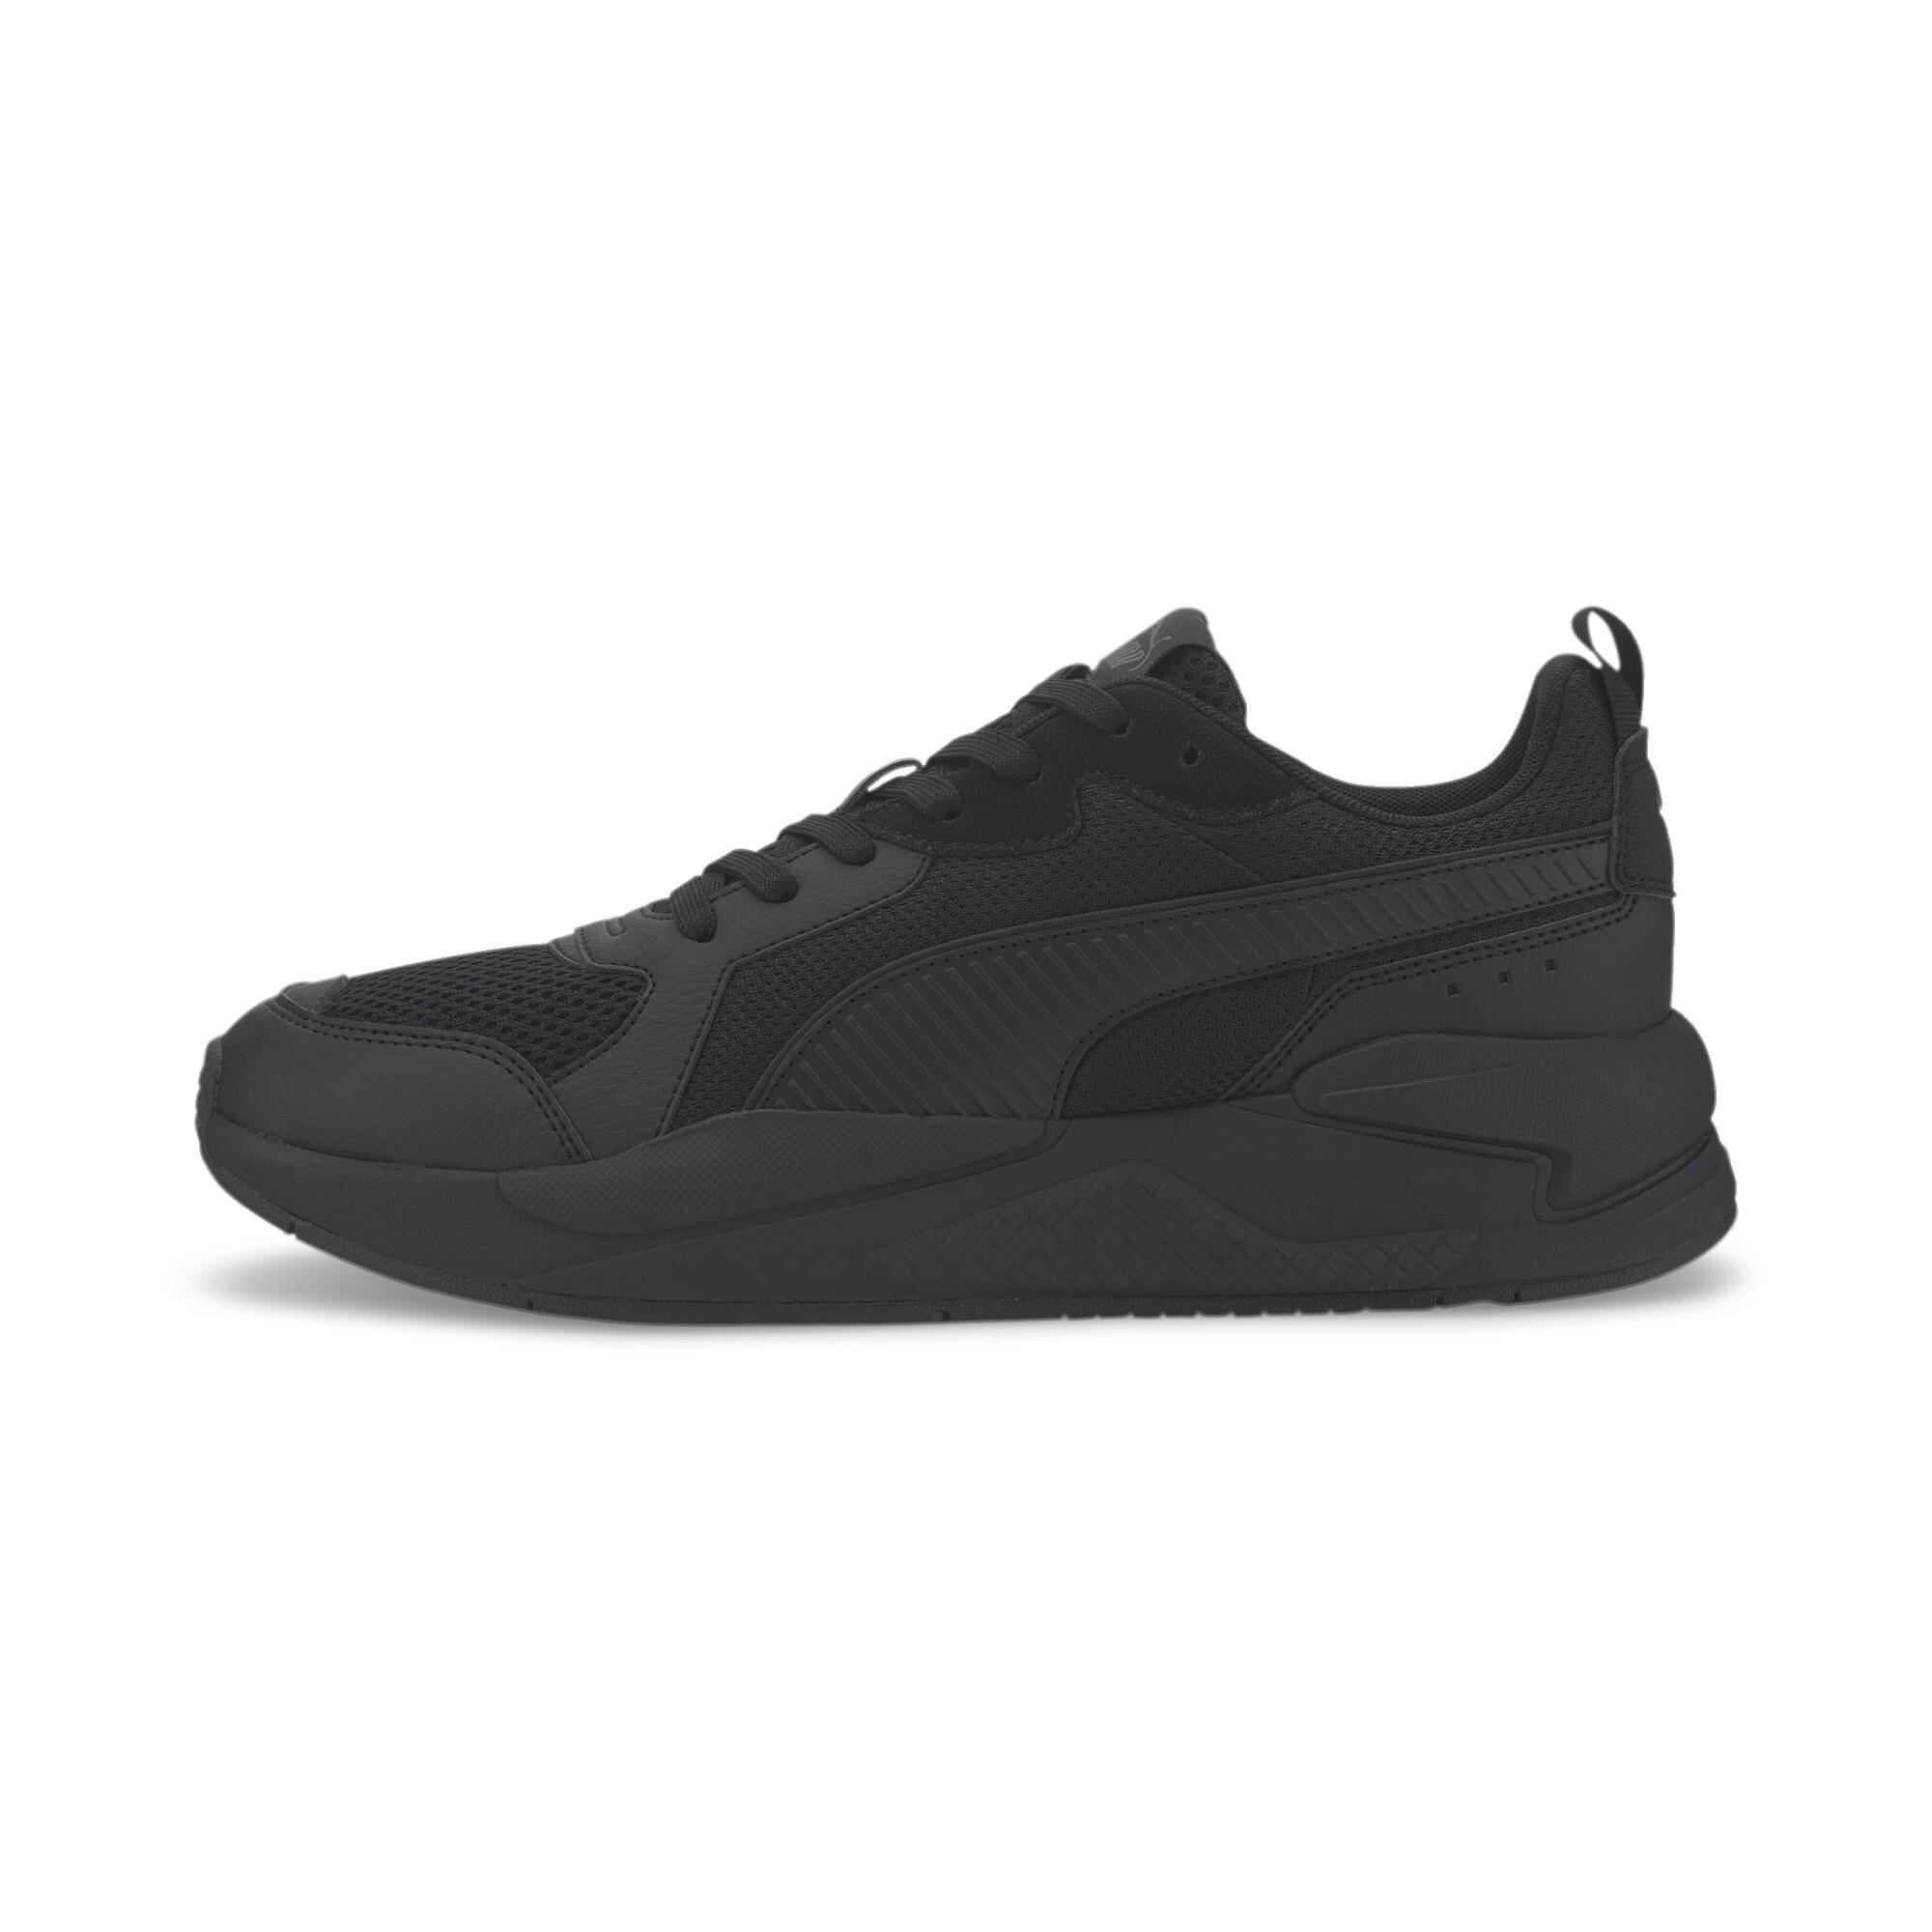 PUMA-Men-039-s-X-RAY-Sneakers thumbnail 18